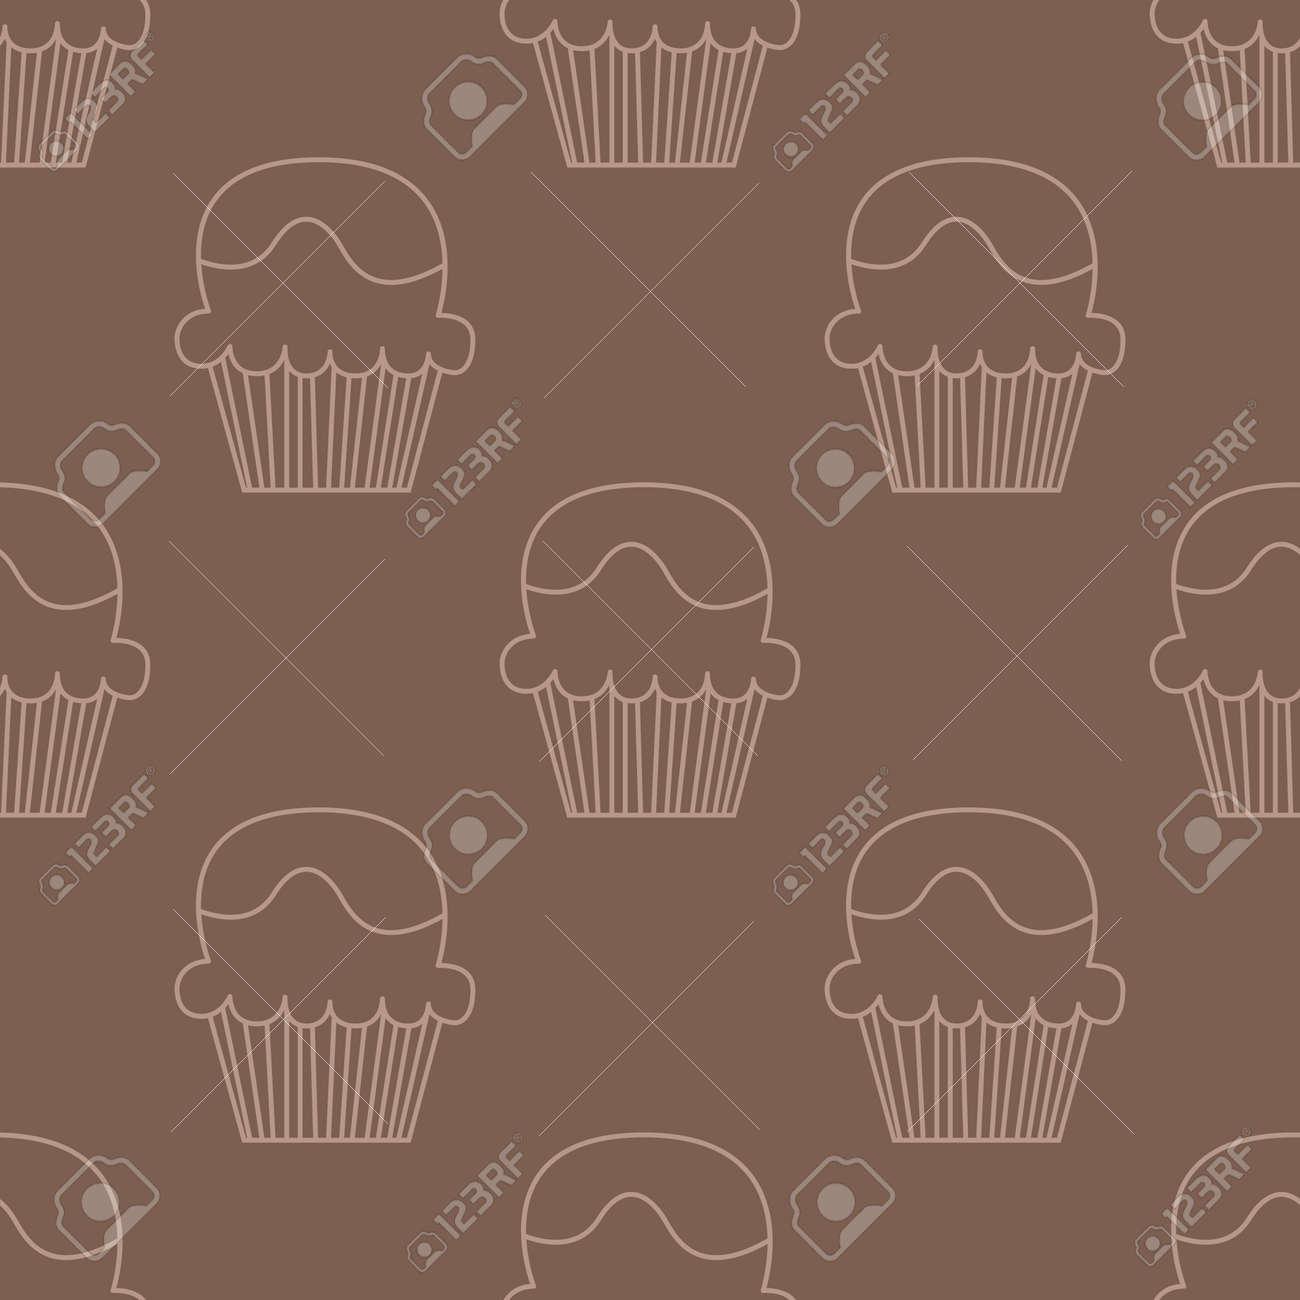 Cream choco cake borderless pattern Stock Vector - 88145103